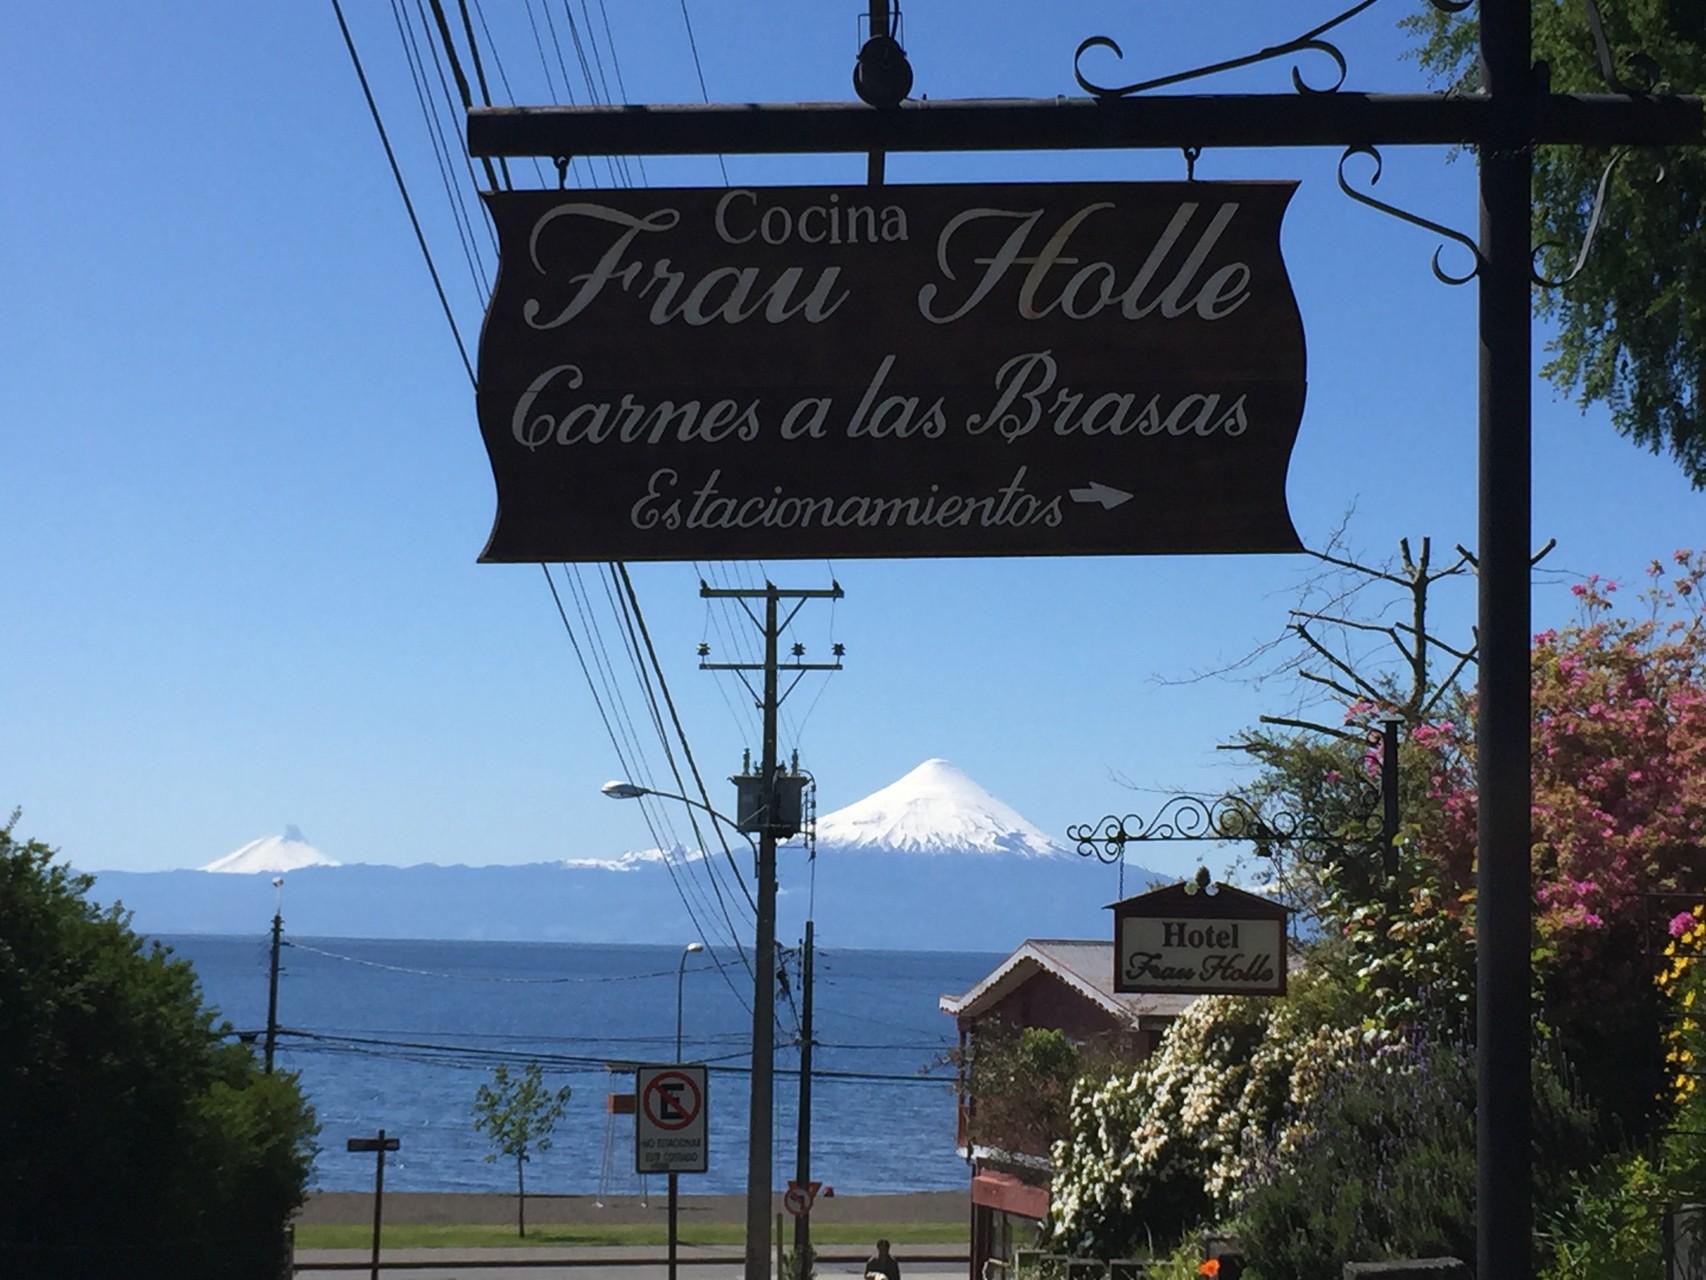 Frau Holle Guesthouse in Frutilar